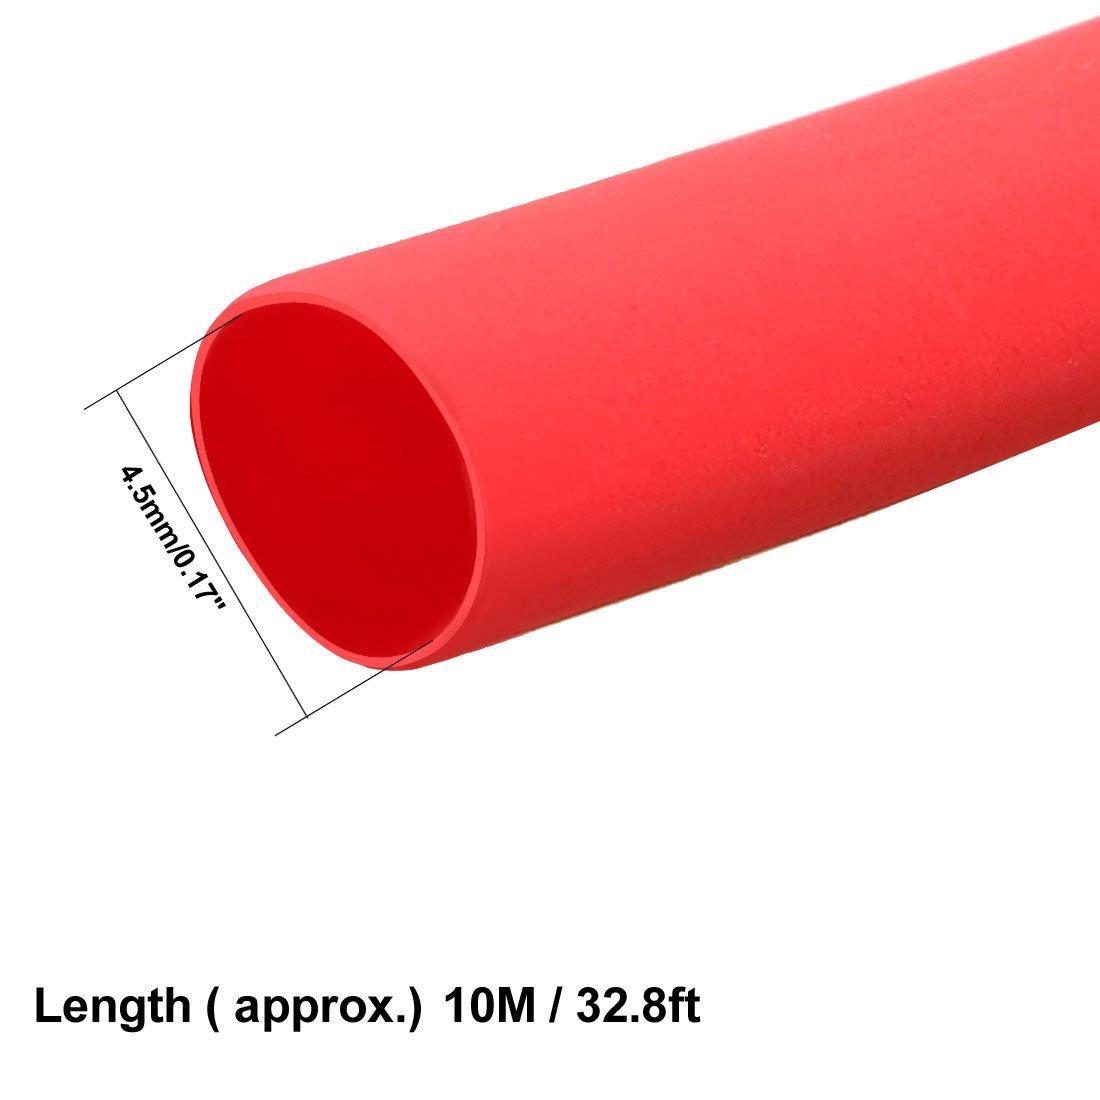 sourcing map Tubo termocontra/íble 2:1 Tubo Aislante el/éctrico Cable forrado de tubos de di/ámetro 8mm Negro Envoltura de 5m de longitud